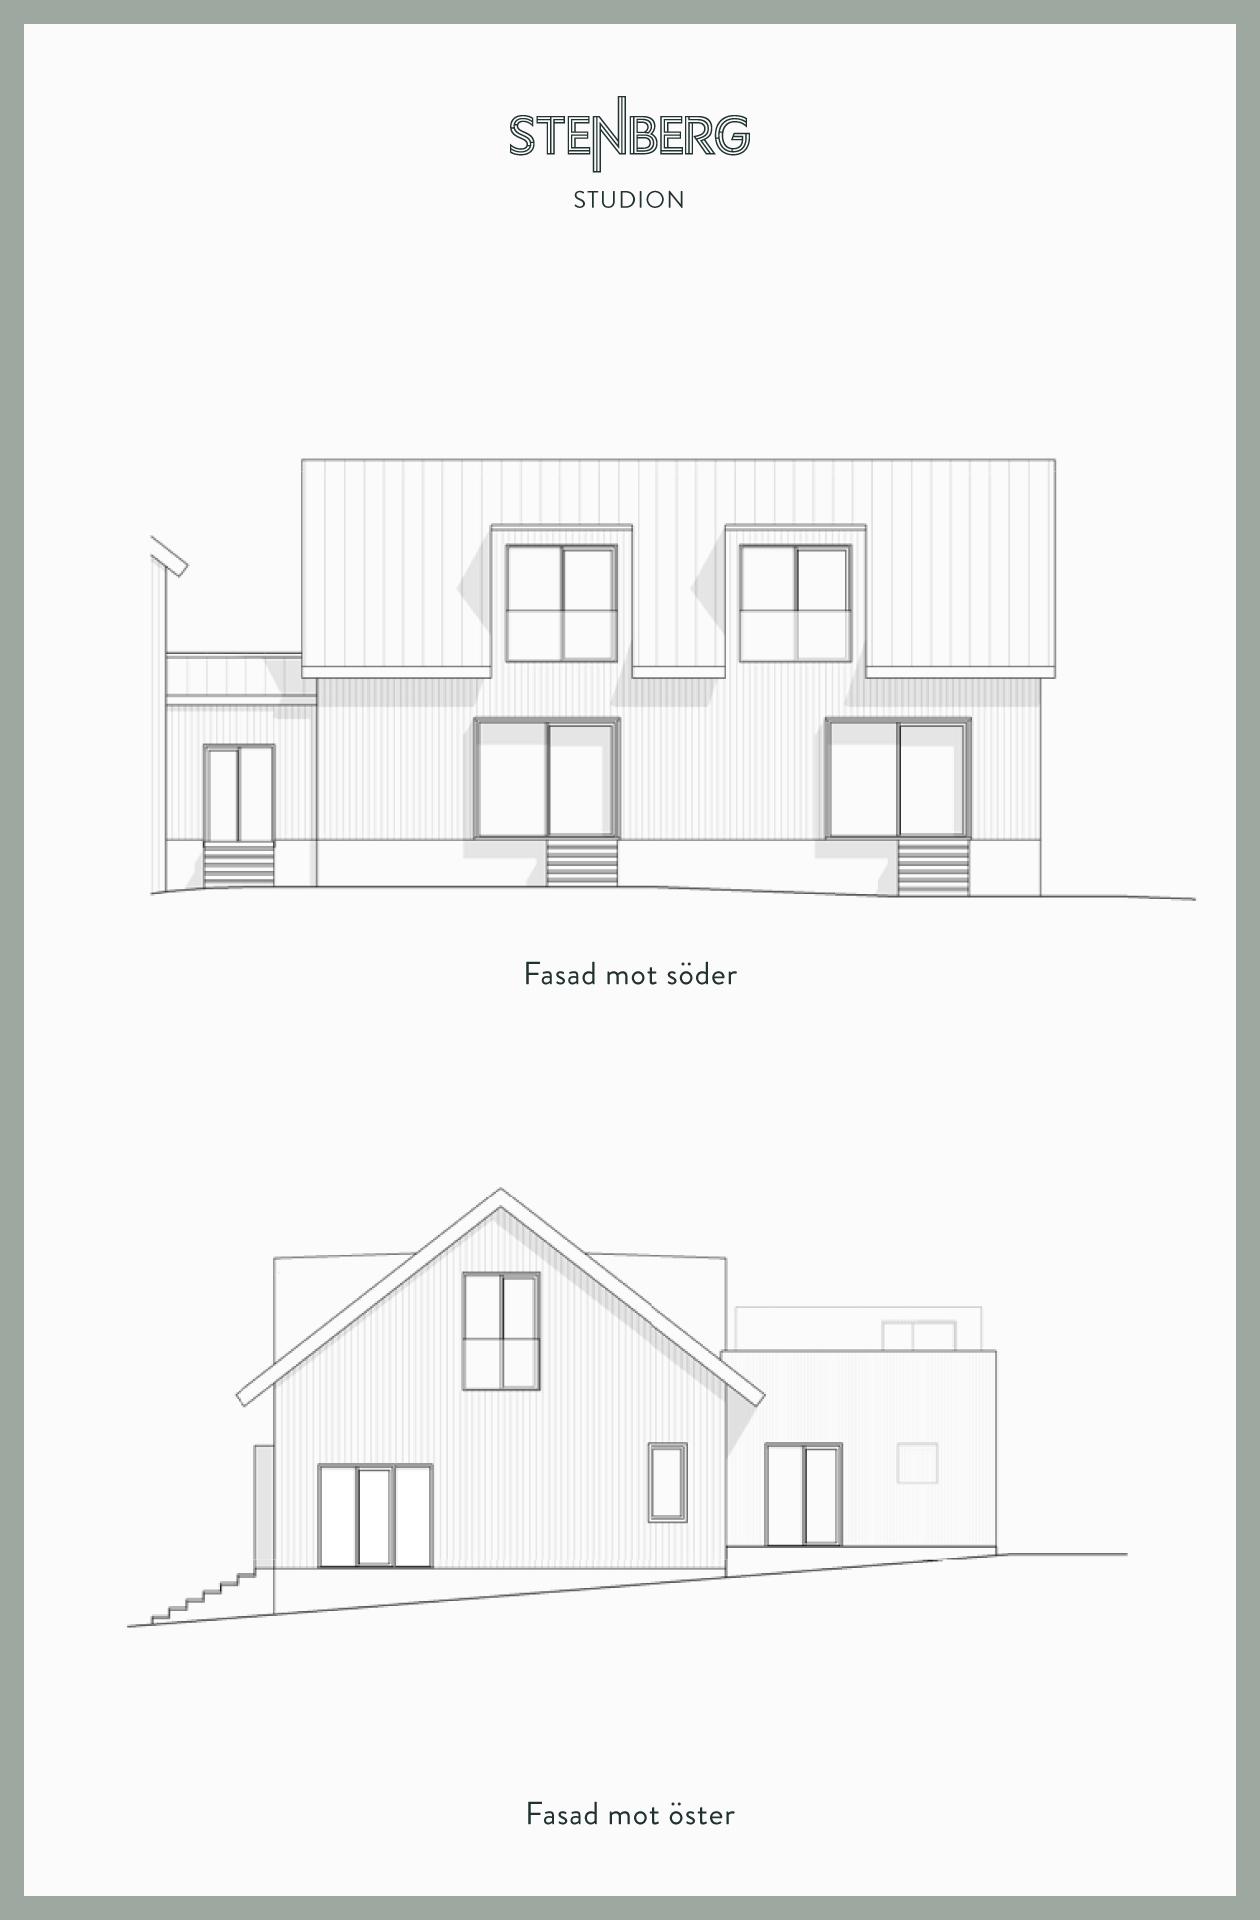 Stenberg-ritningar-Studion 4.jpg